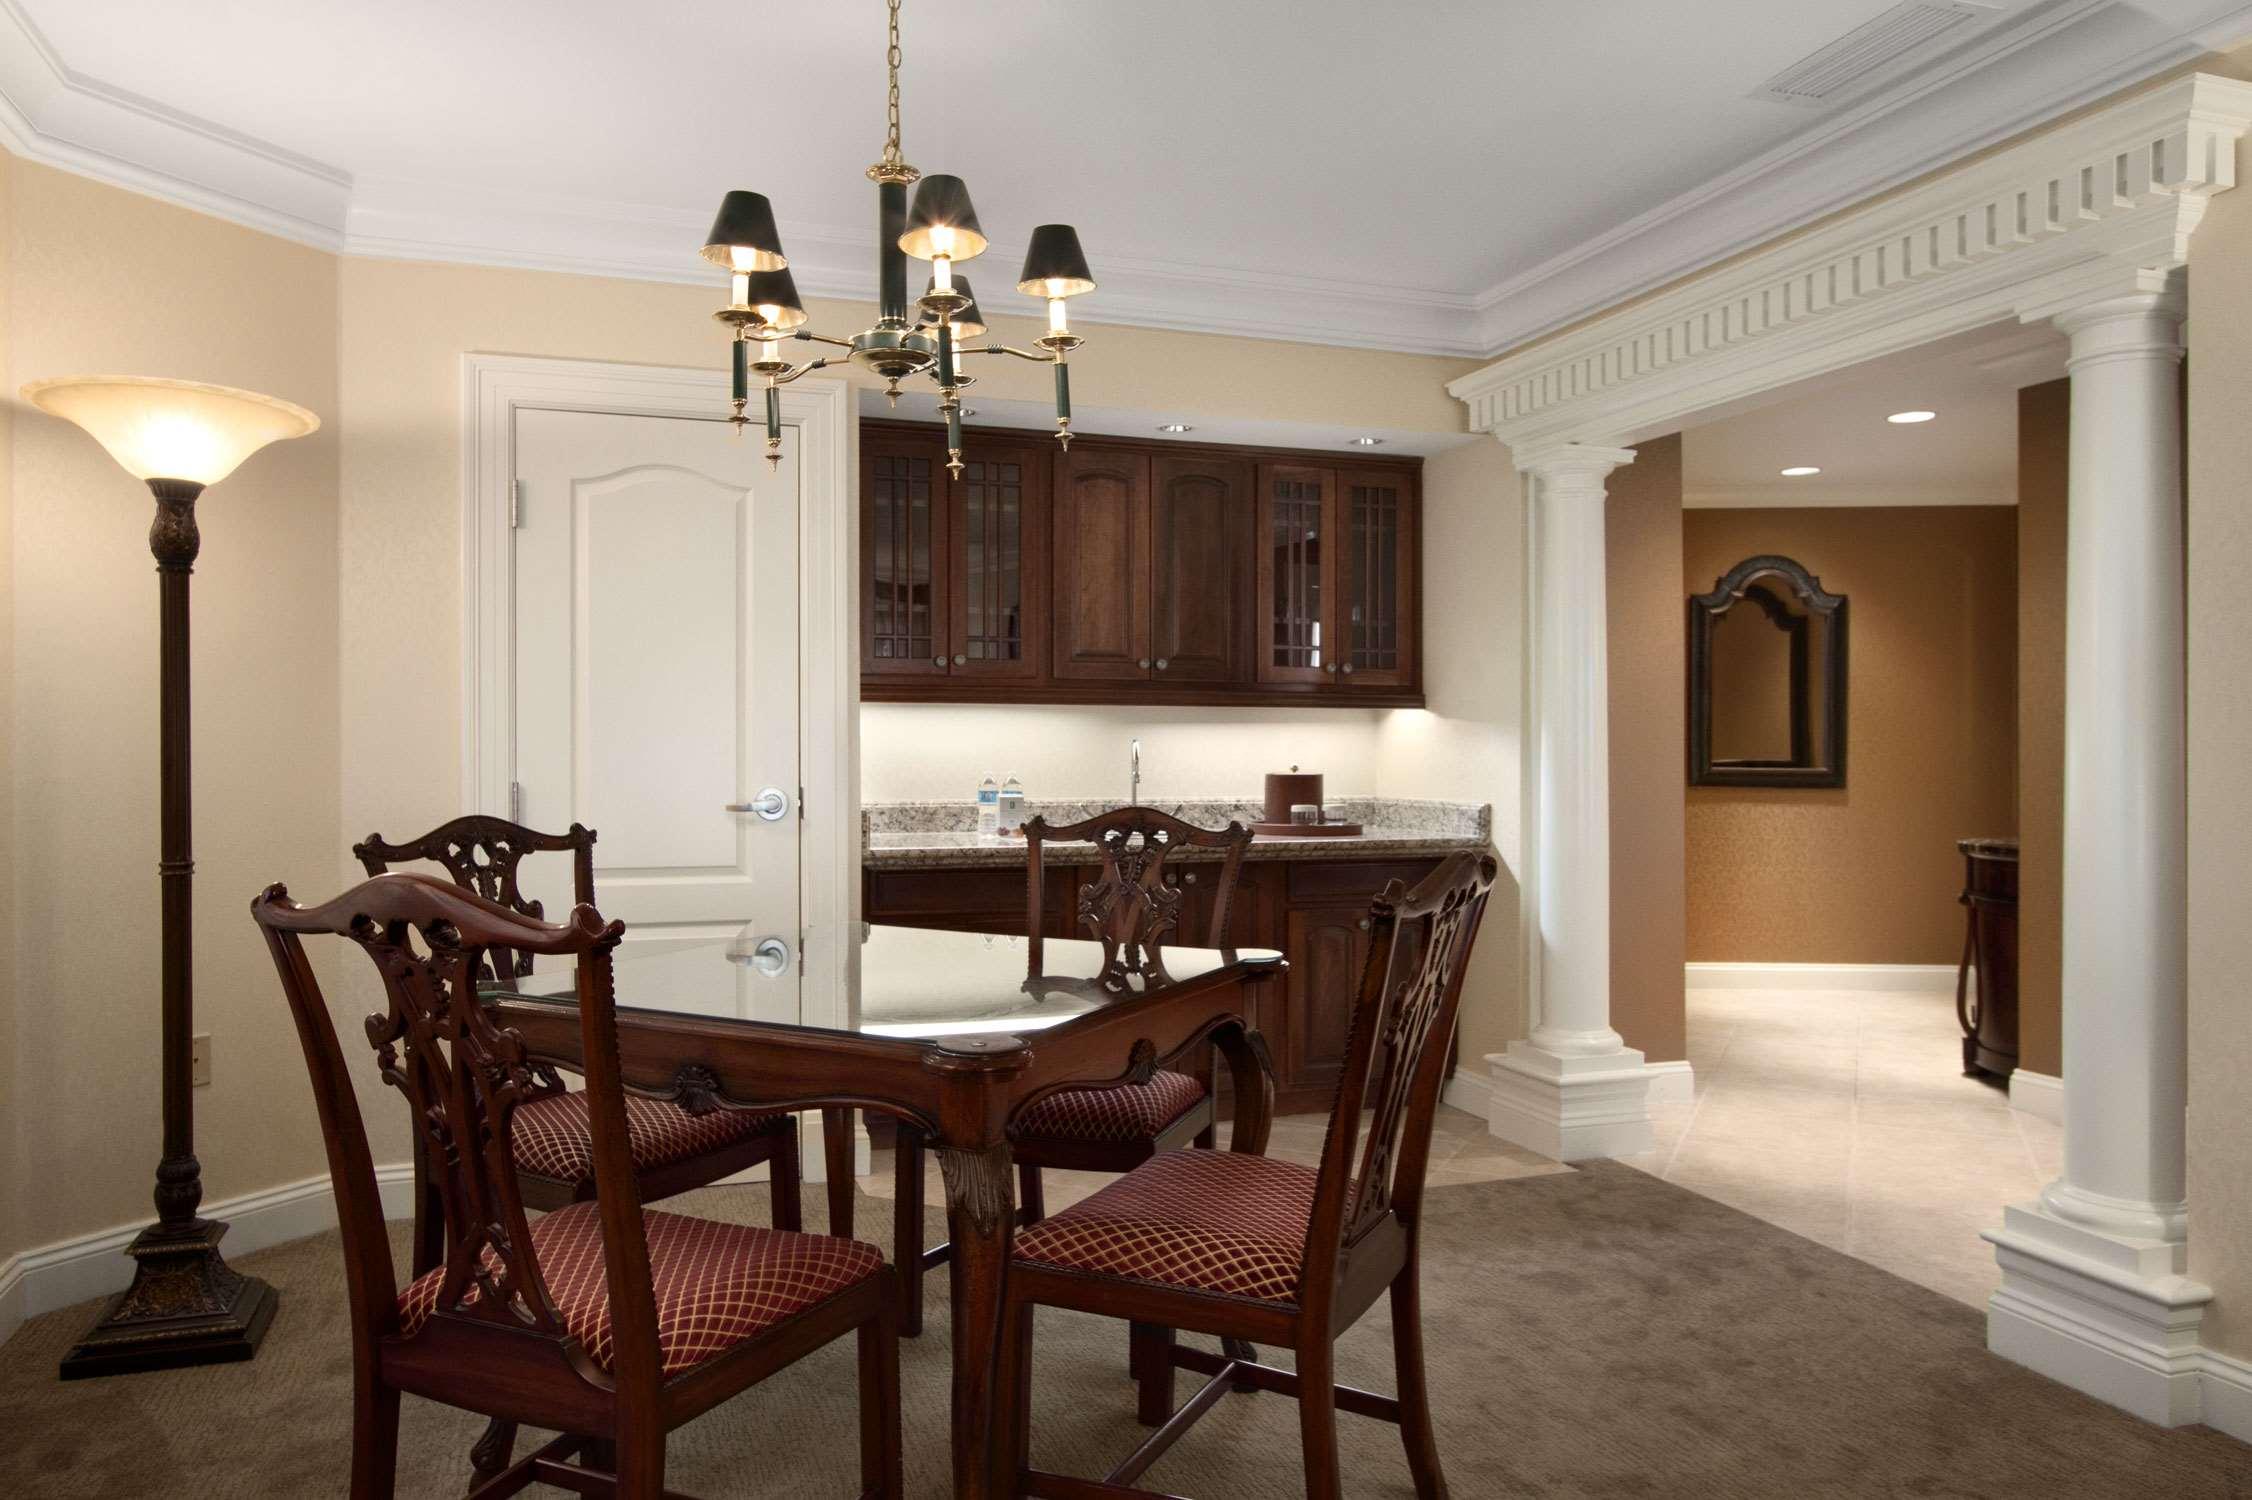 Embassy Suites by Hilton Washington DC Convention Center image 18